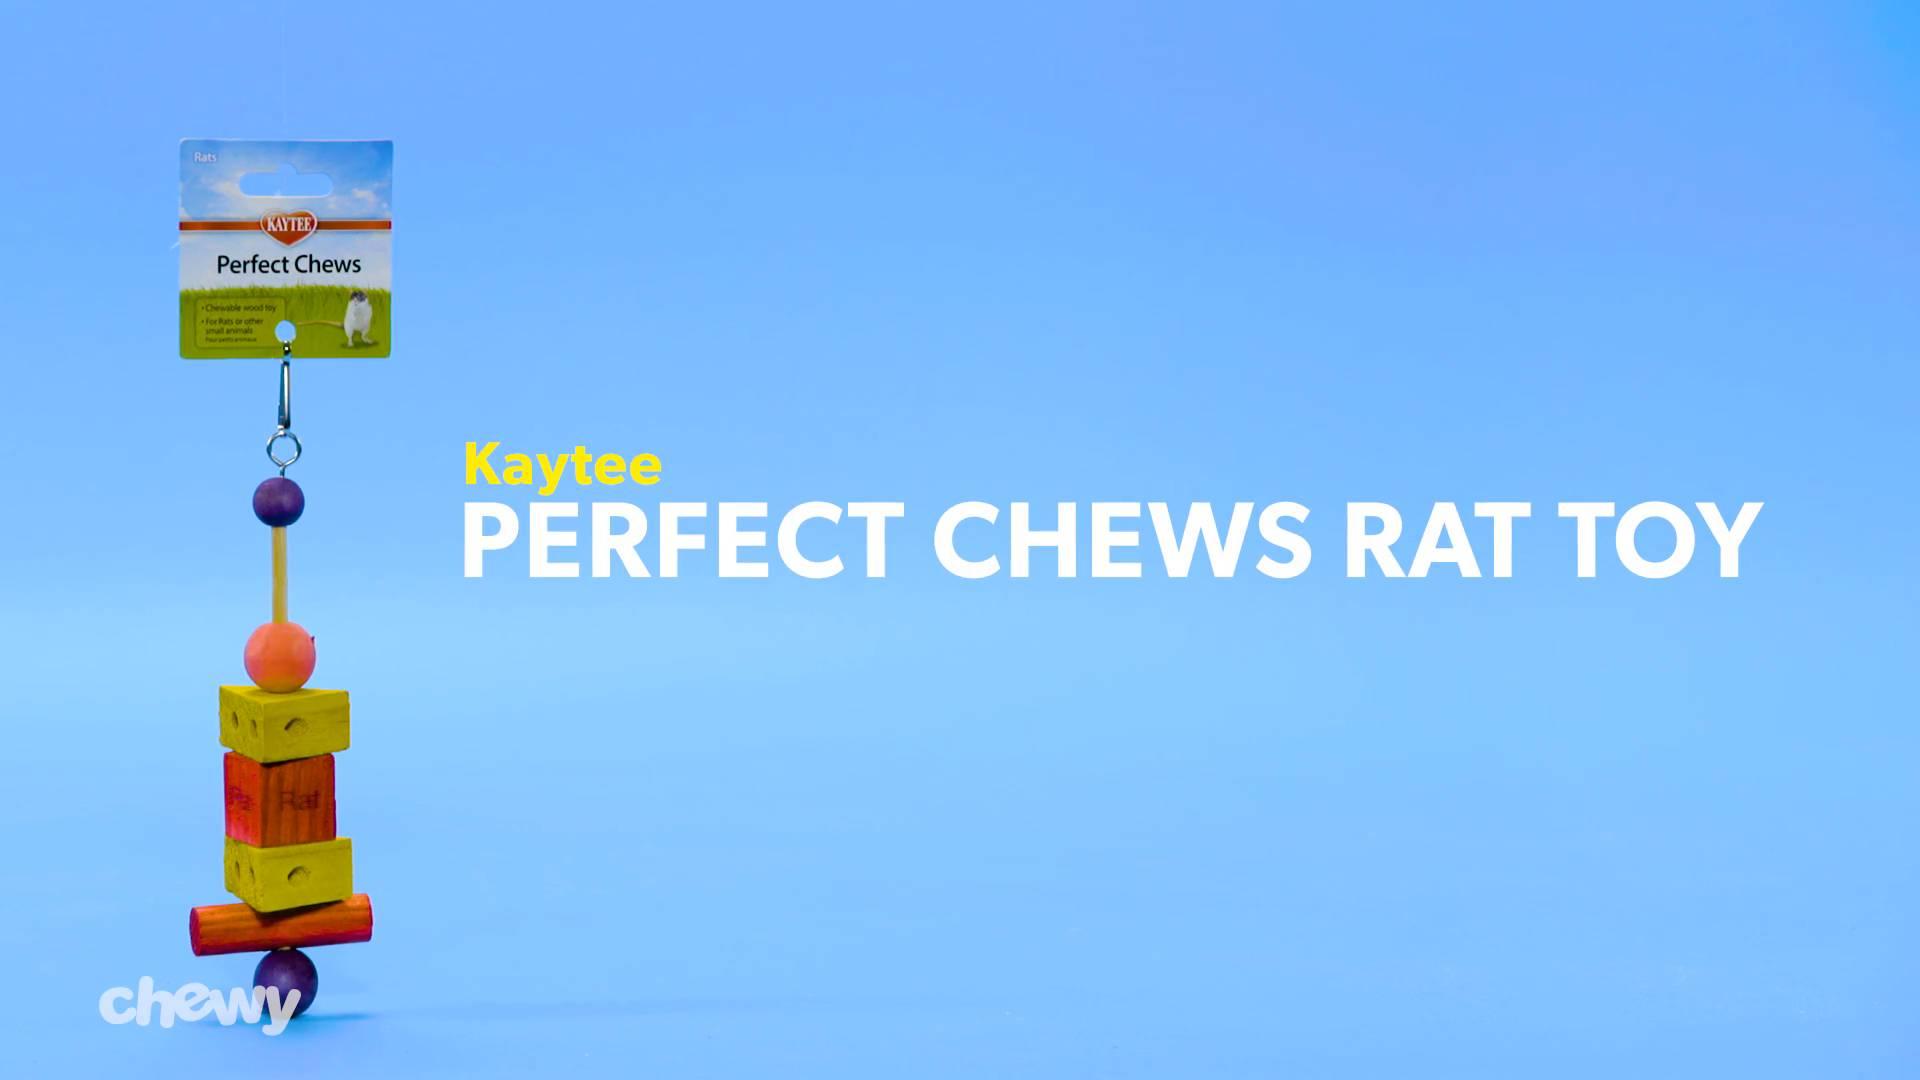 Kaytee Perfect Chews for Rats